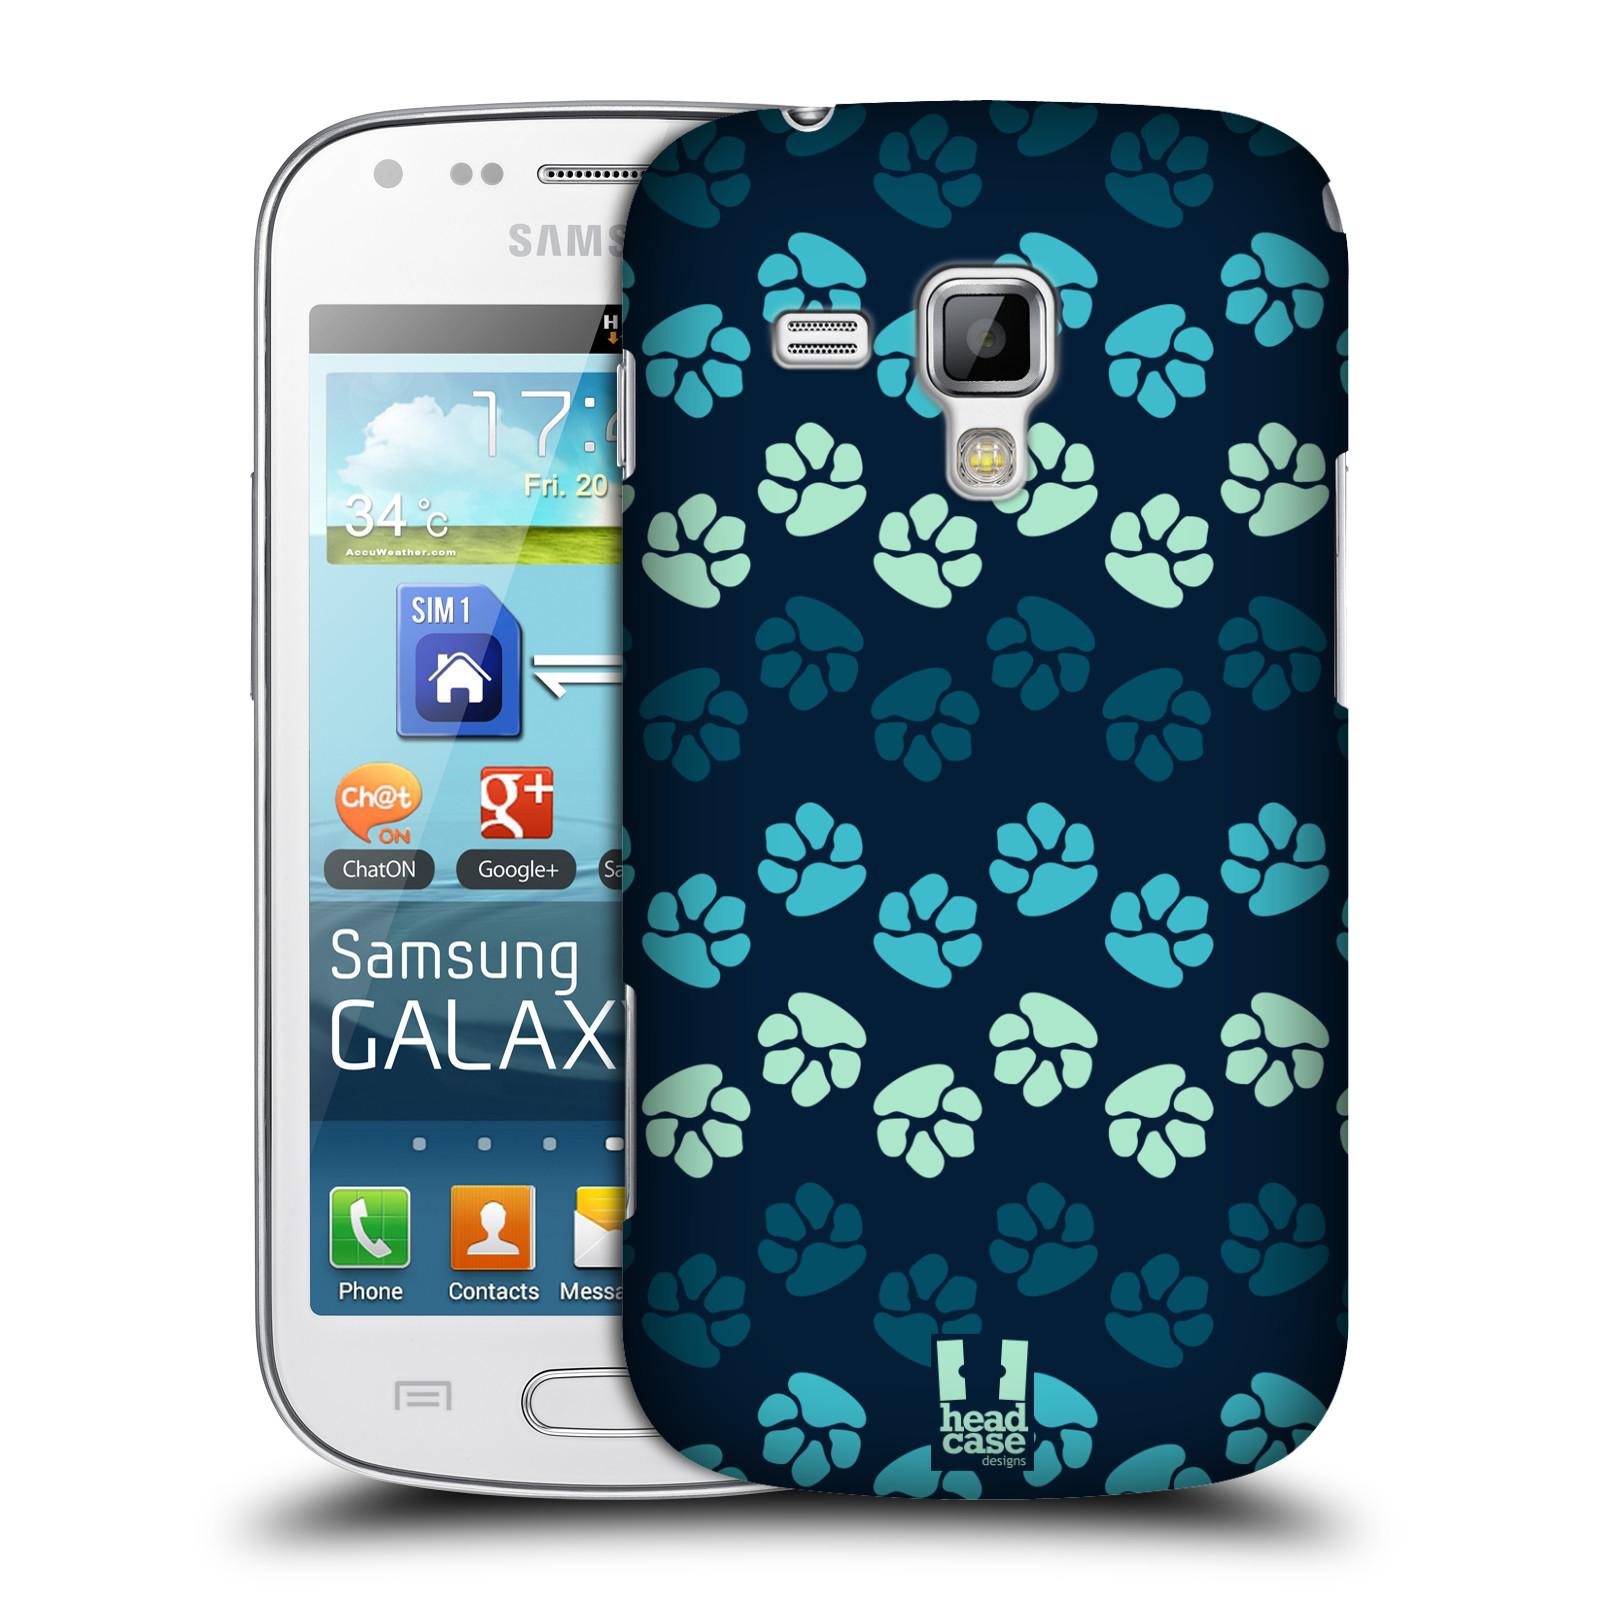 Plastové pouzdro na mobil Samsung Galaxy Trend Plus HEAD CASE TLAPKY MODRÉ (Kryt či obal na mobilní telefon Samsung Galaxy Trend Plus GT-S7580)